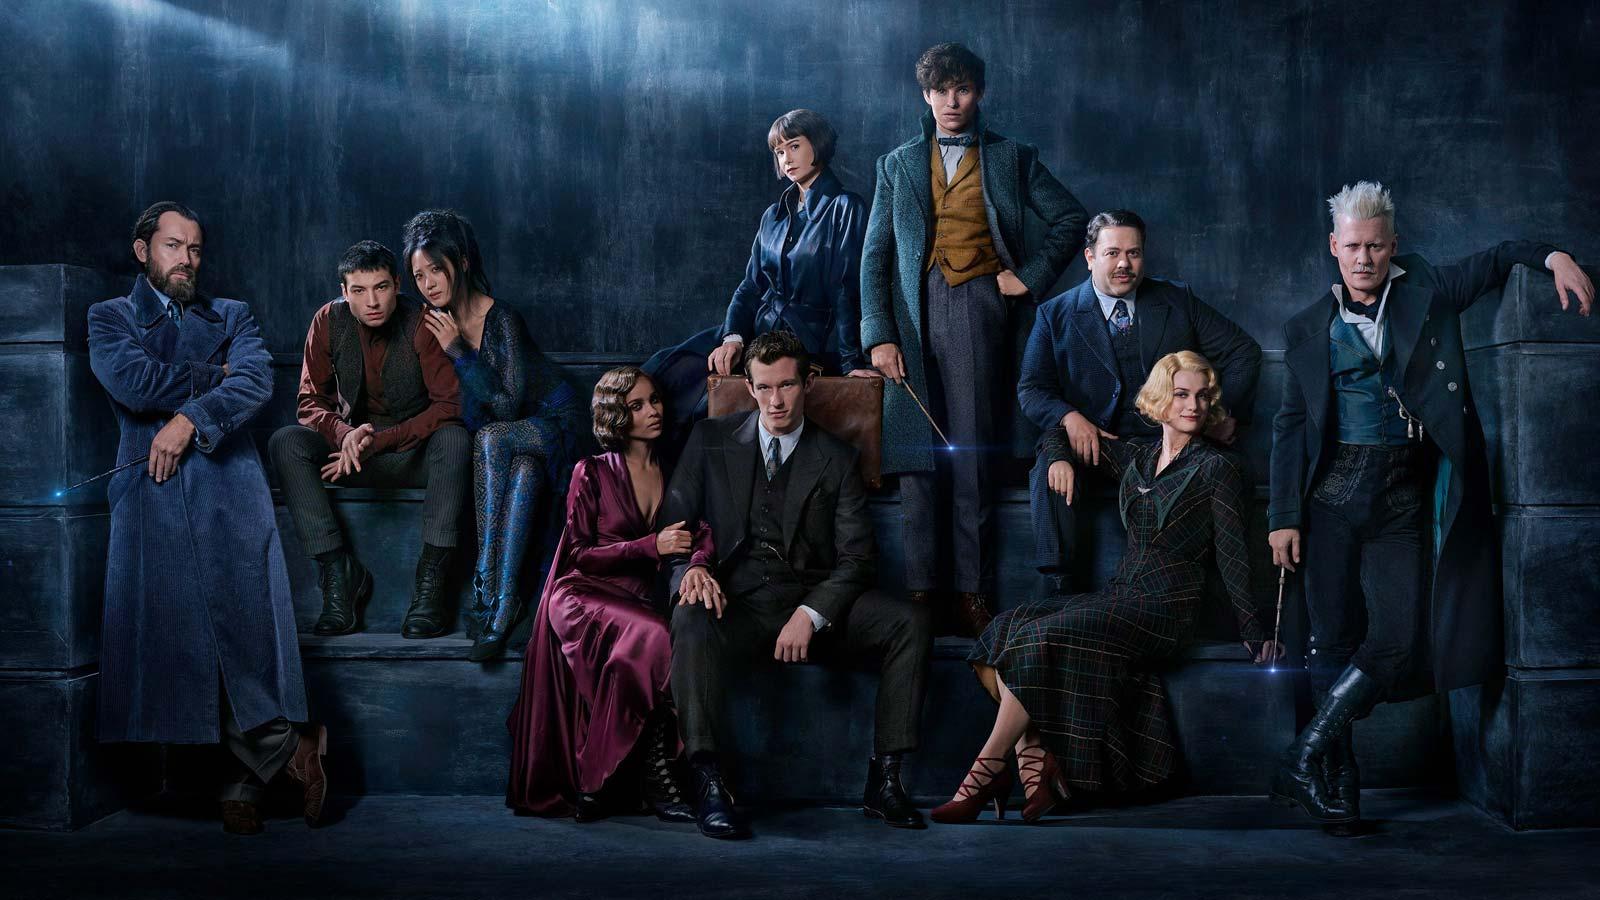 Le casting des Crimes de Grindelwald